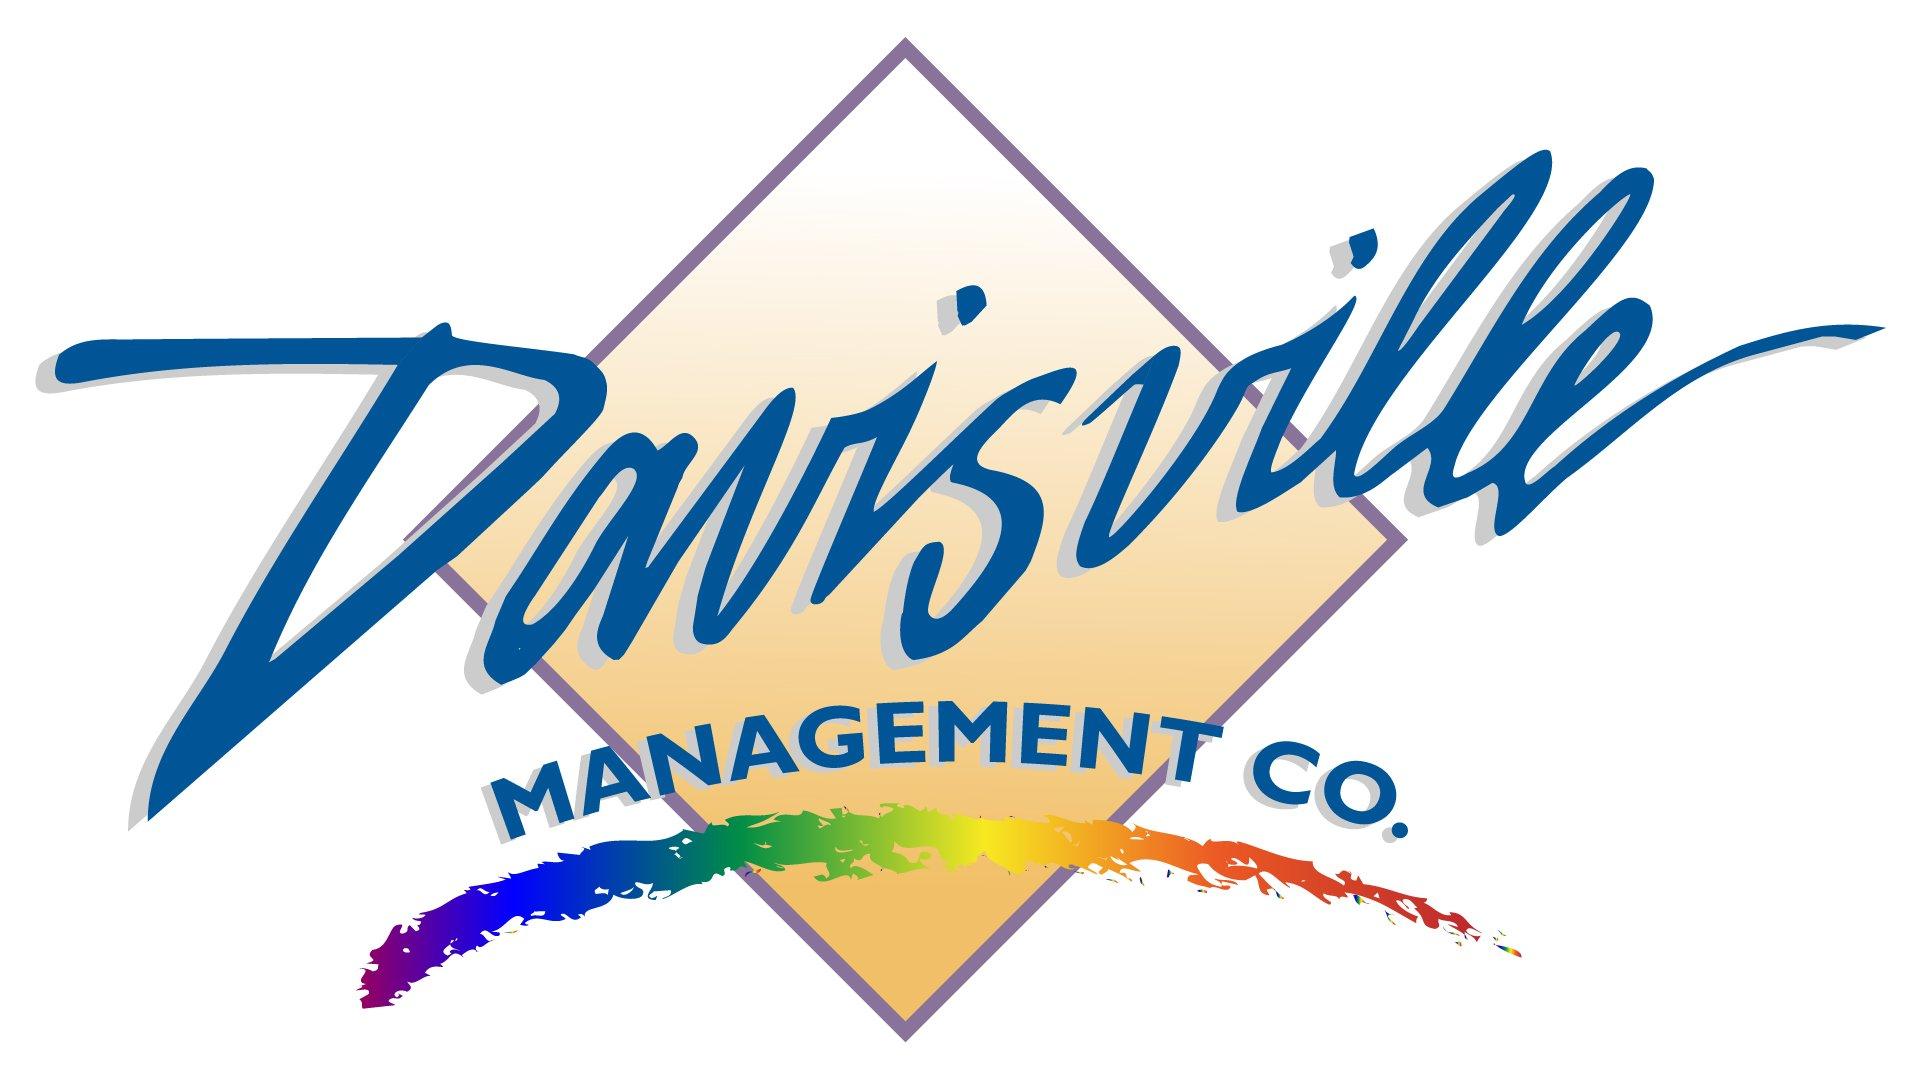 Davisville Management Company Logo